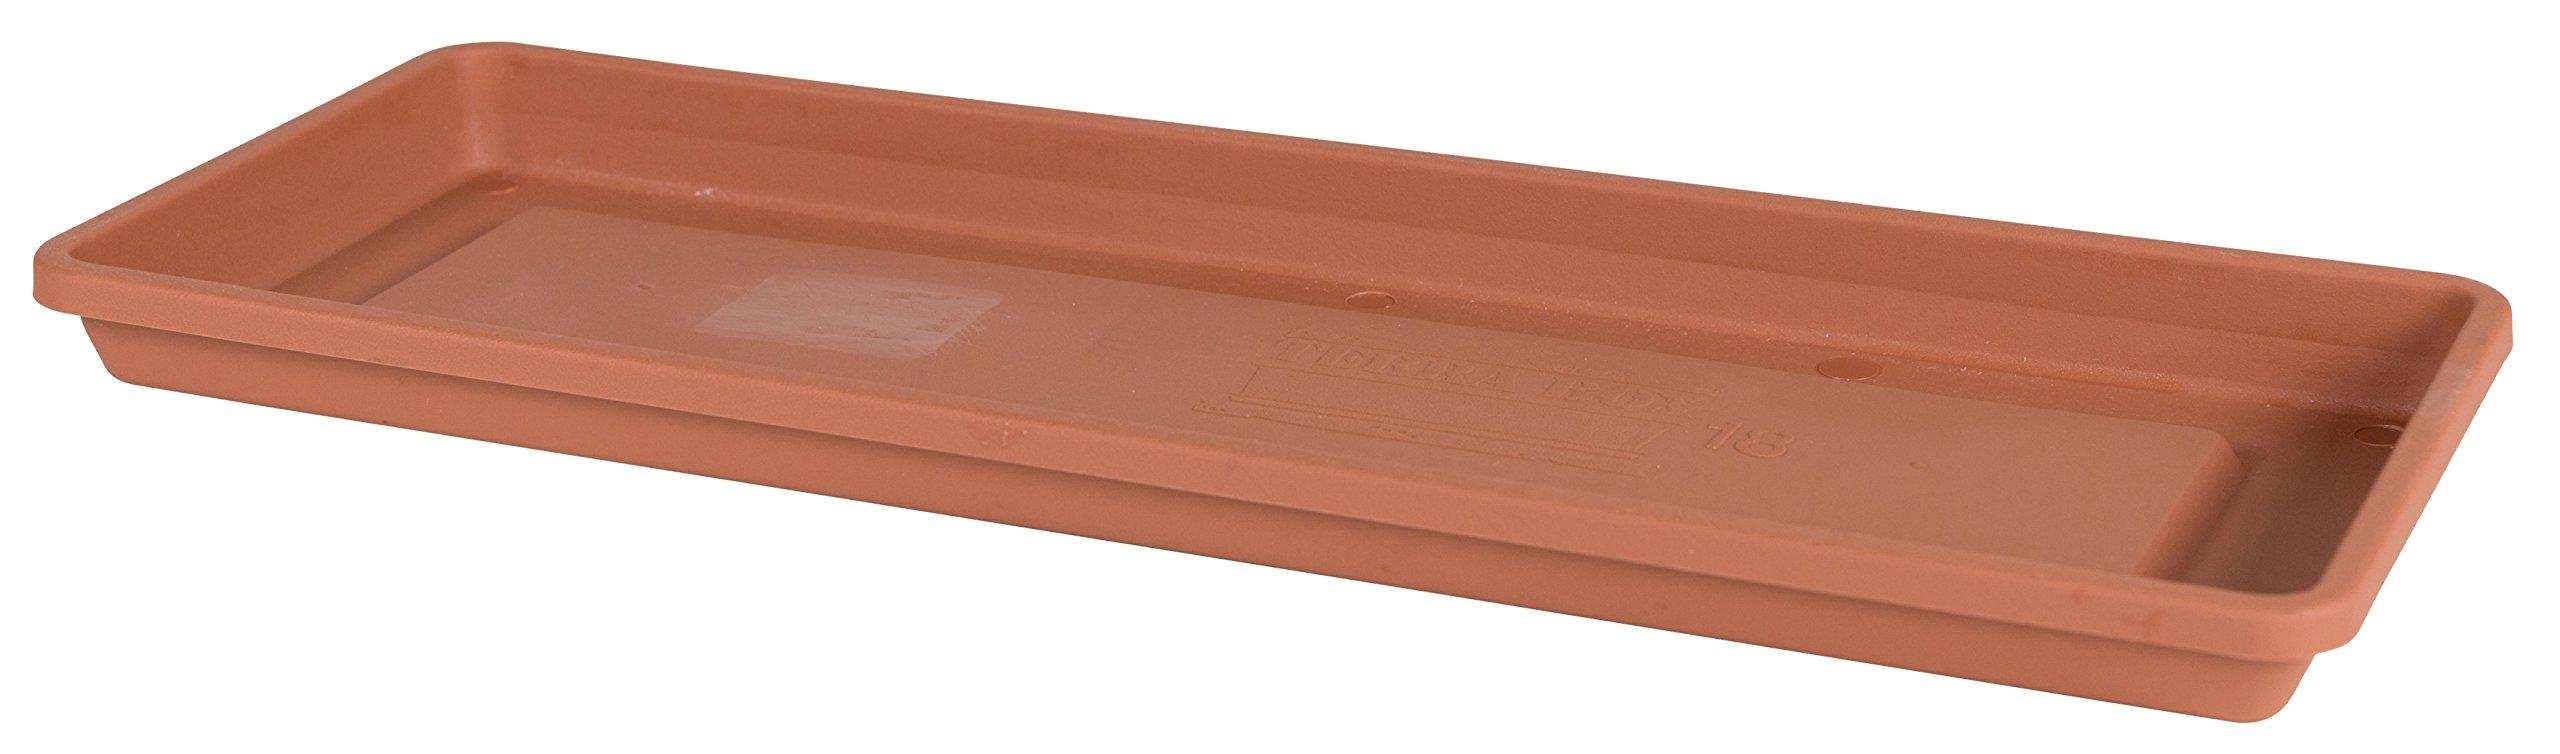 Bloem Fiskars 30 Inch TerraBox Tray, Color Clay